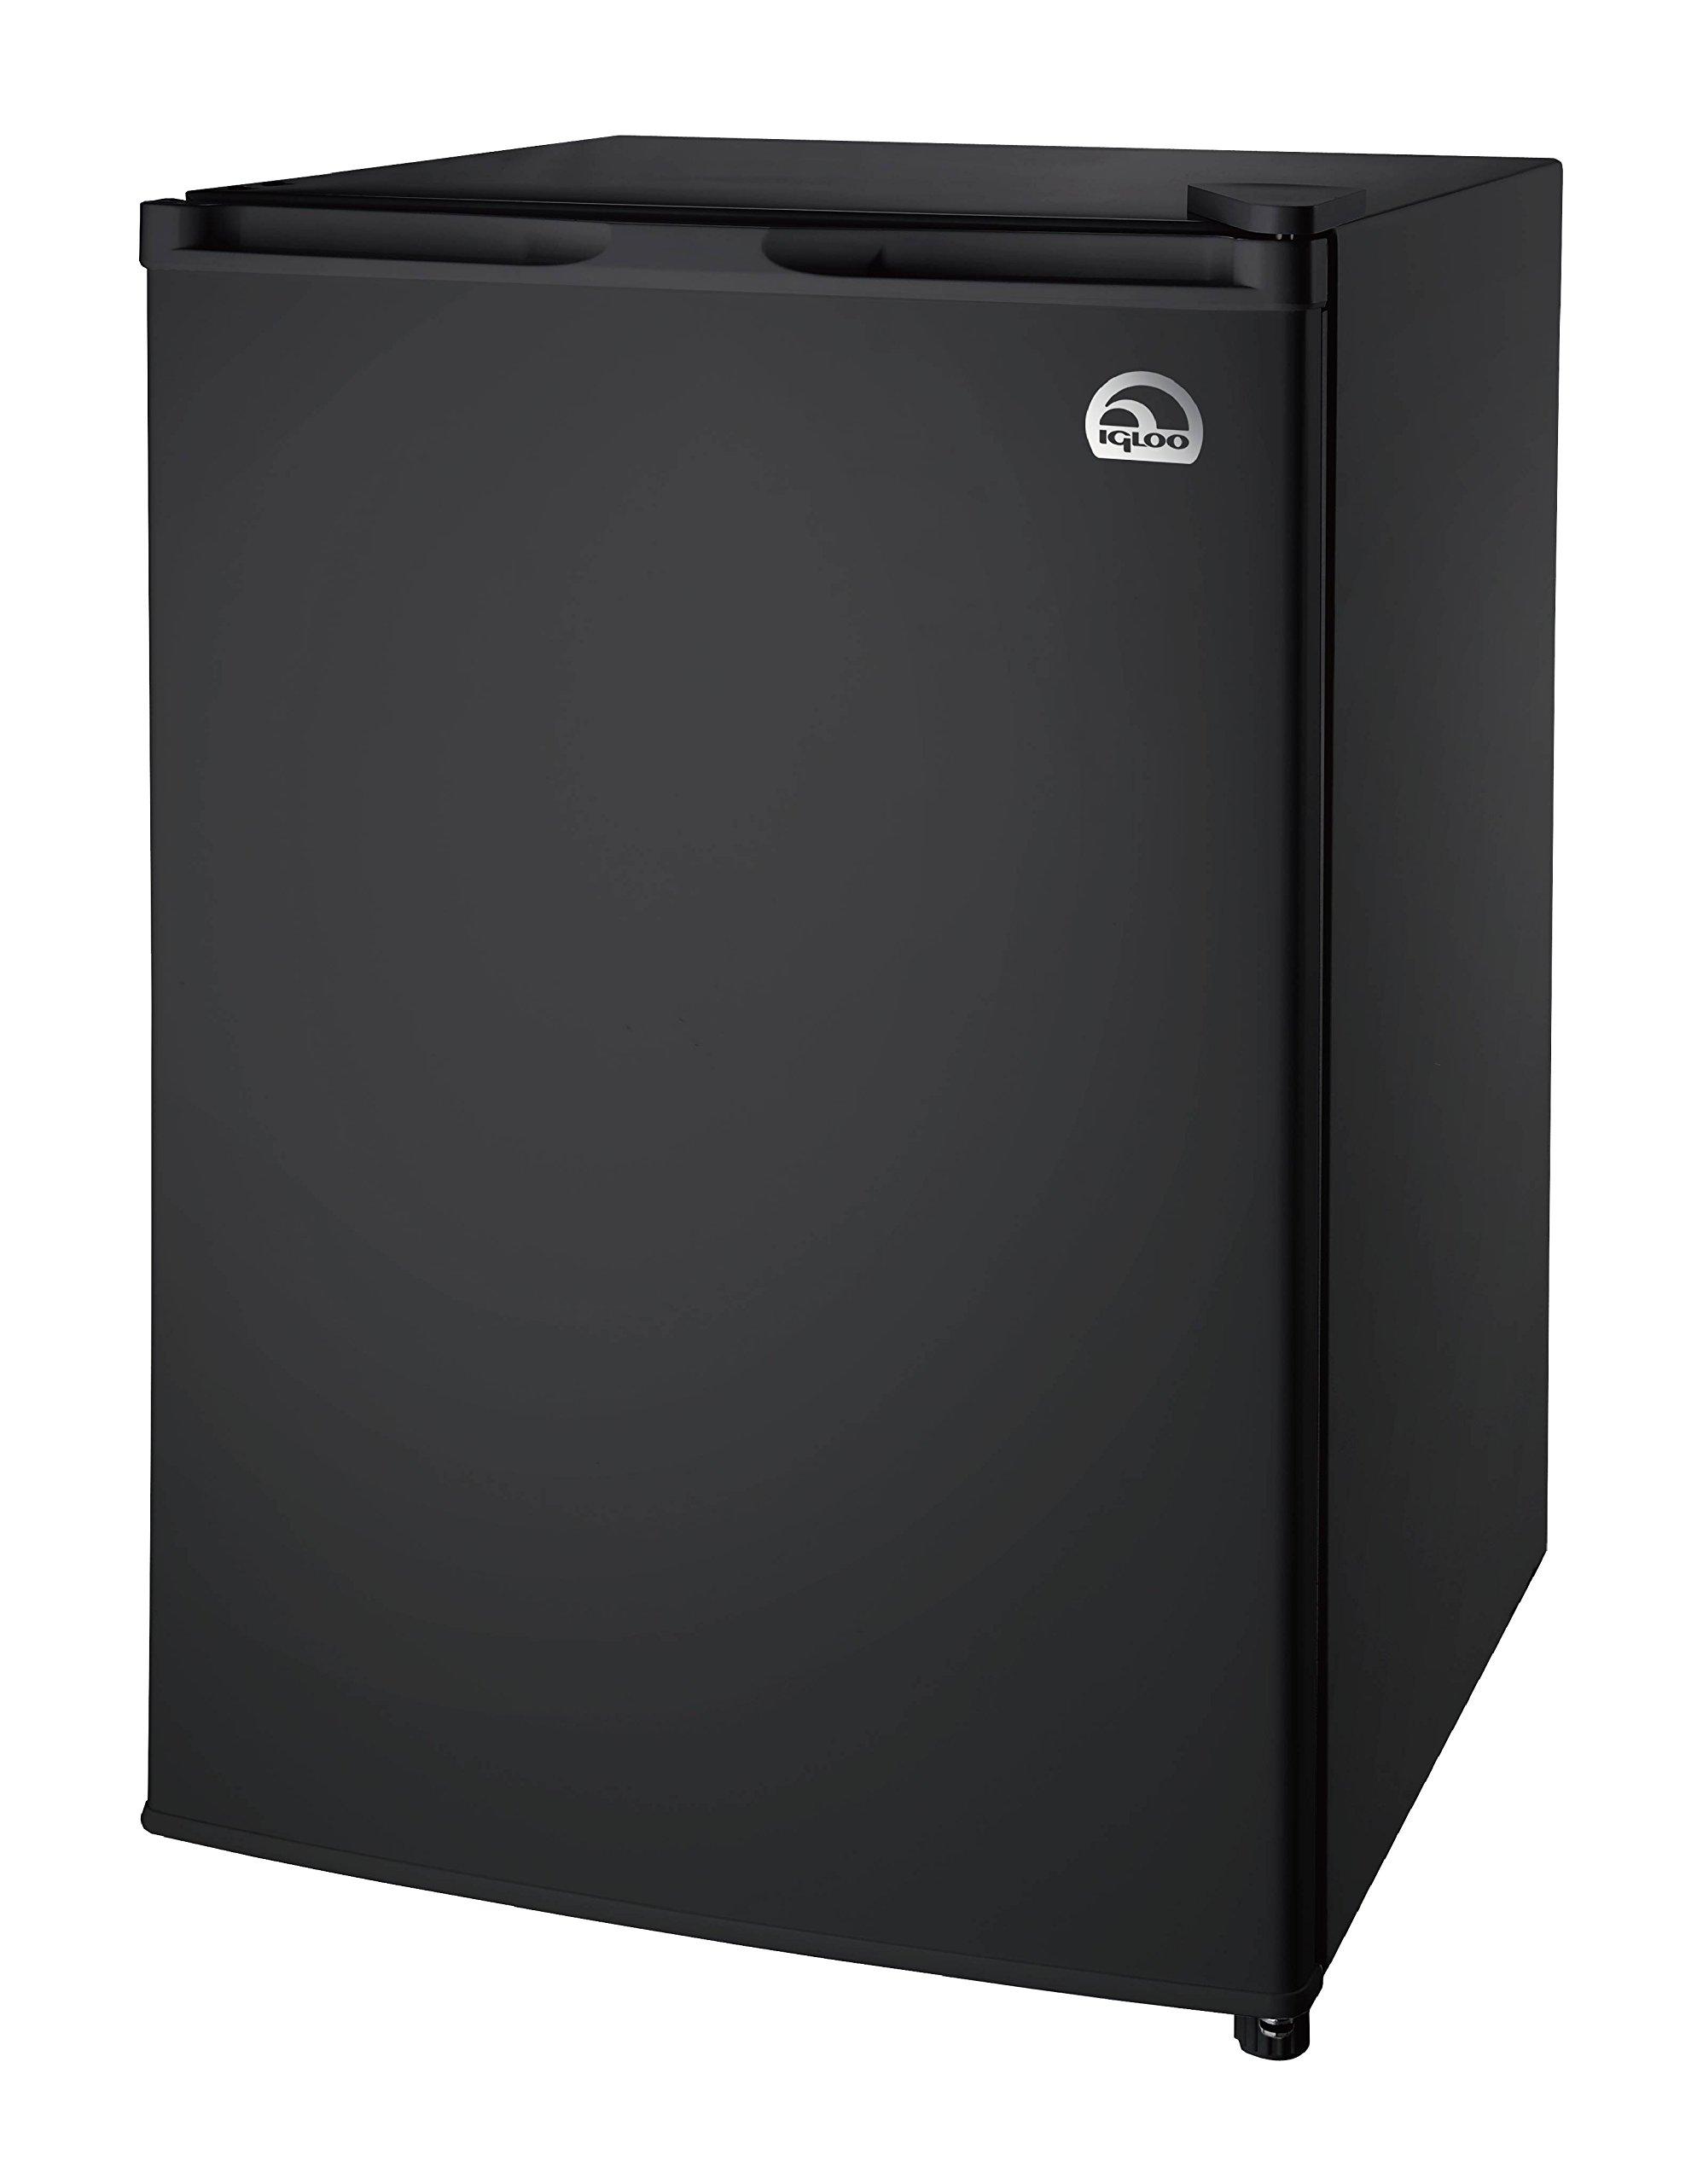 Igloo FR283I-B-BLACK Refrigerator, 2.6 cu. ft., Black